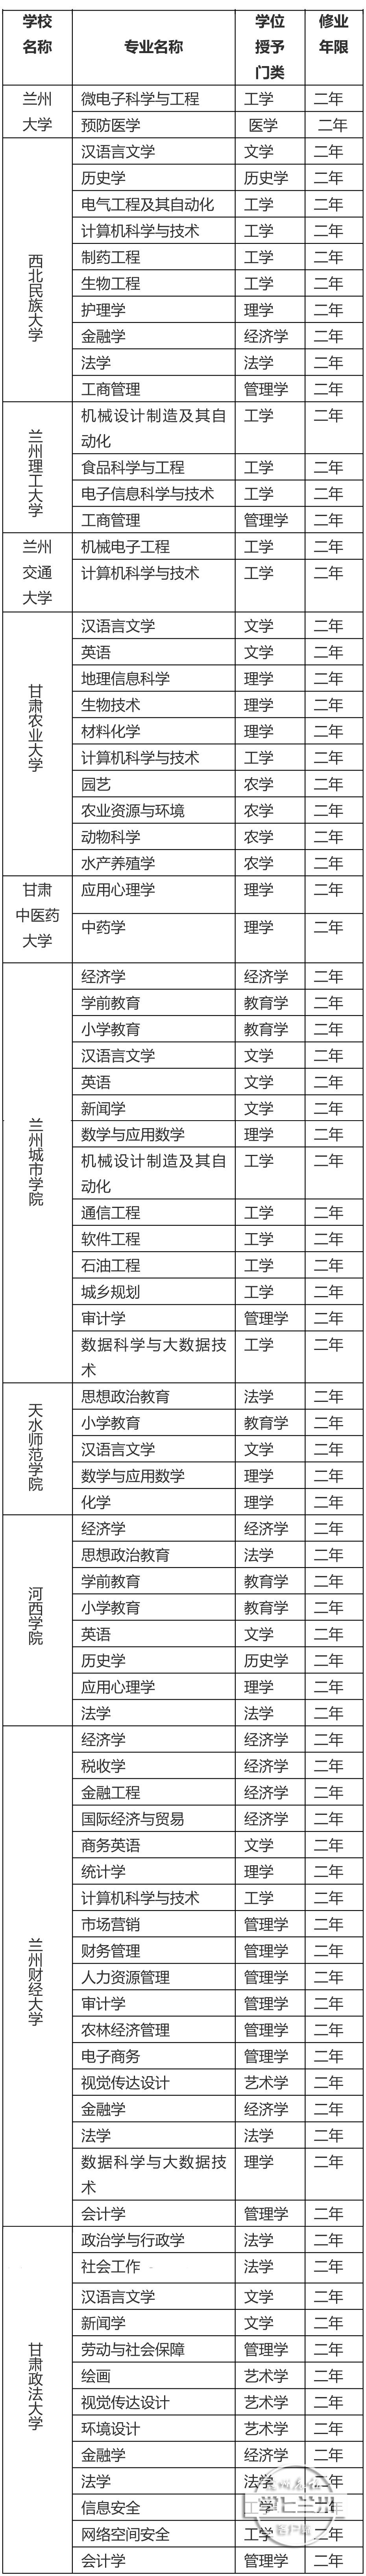 http://www.lzhmzz.com/lanzhoufangchan/116599.html